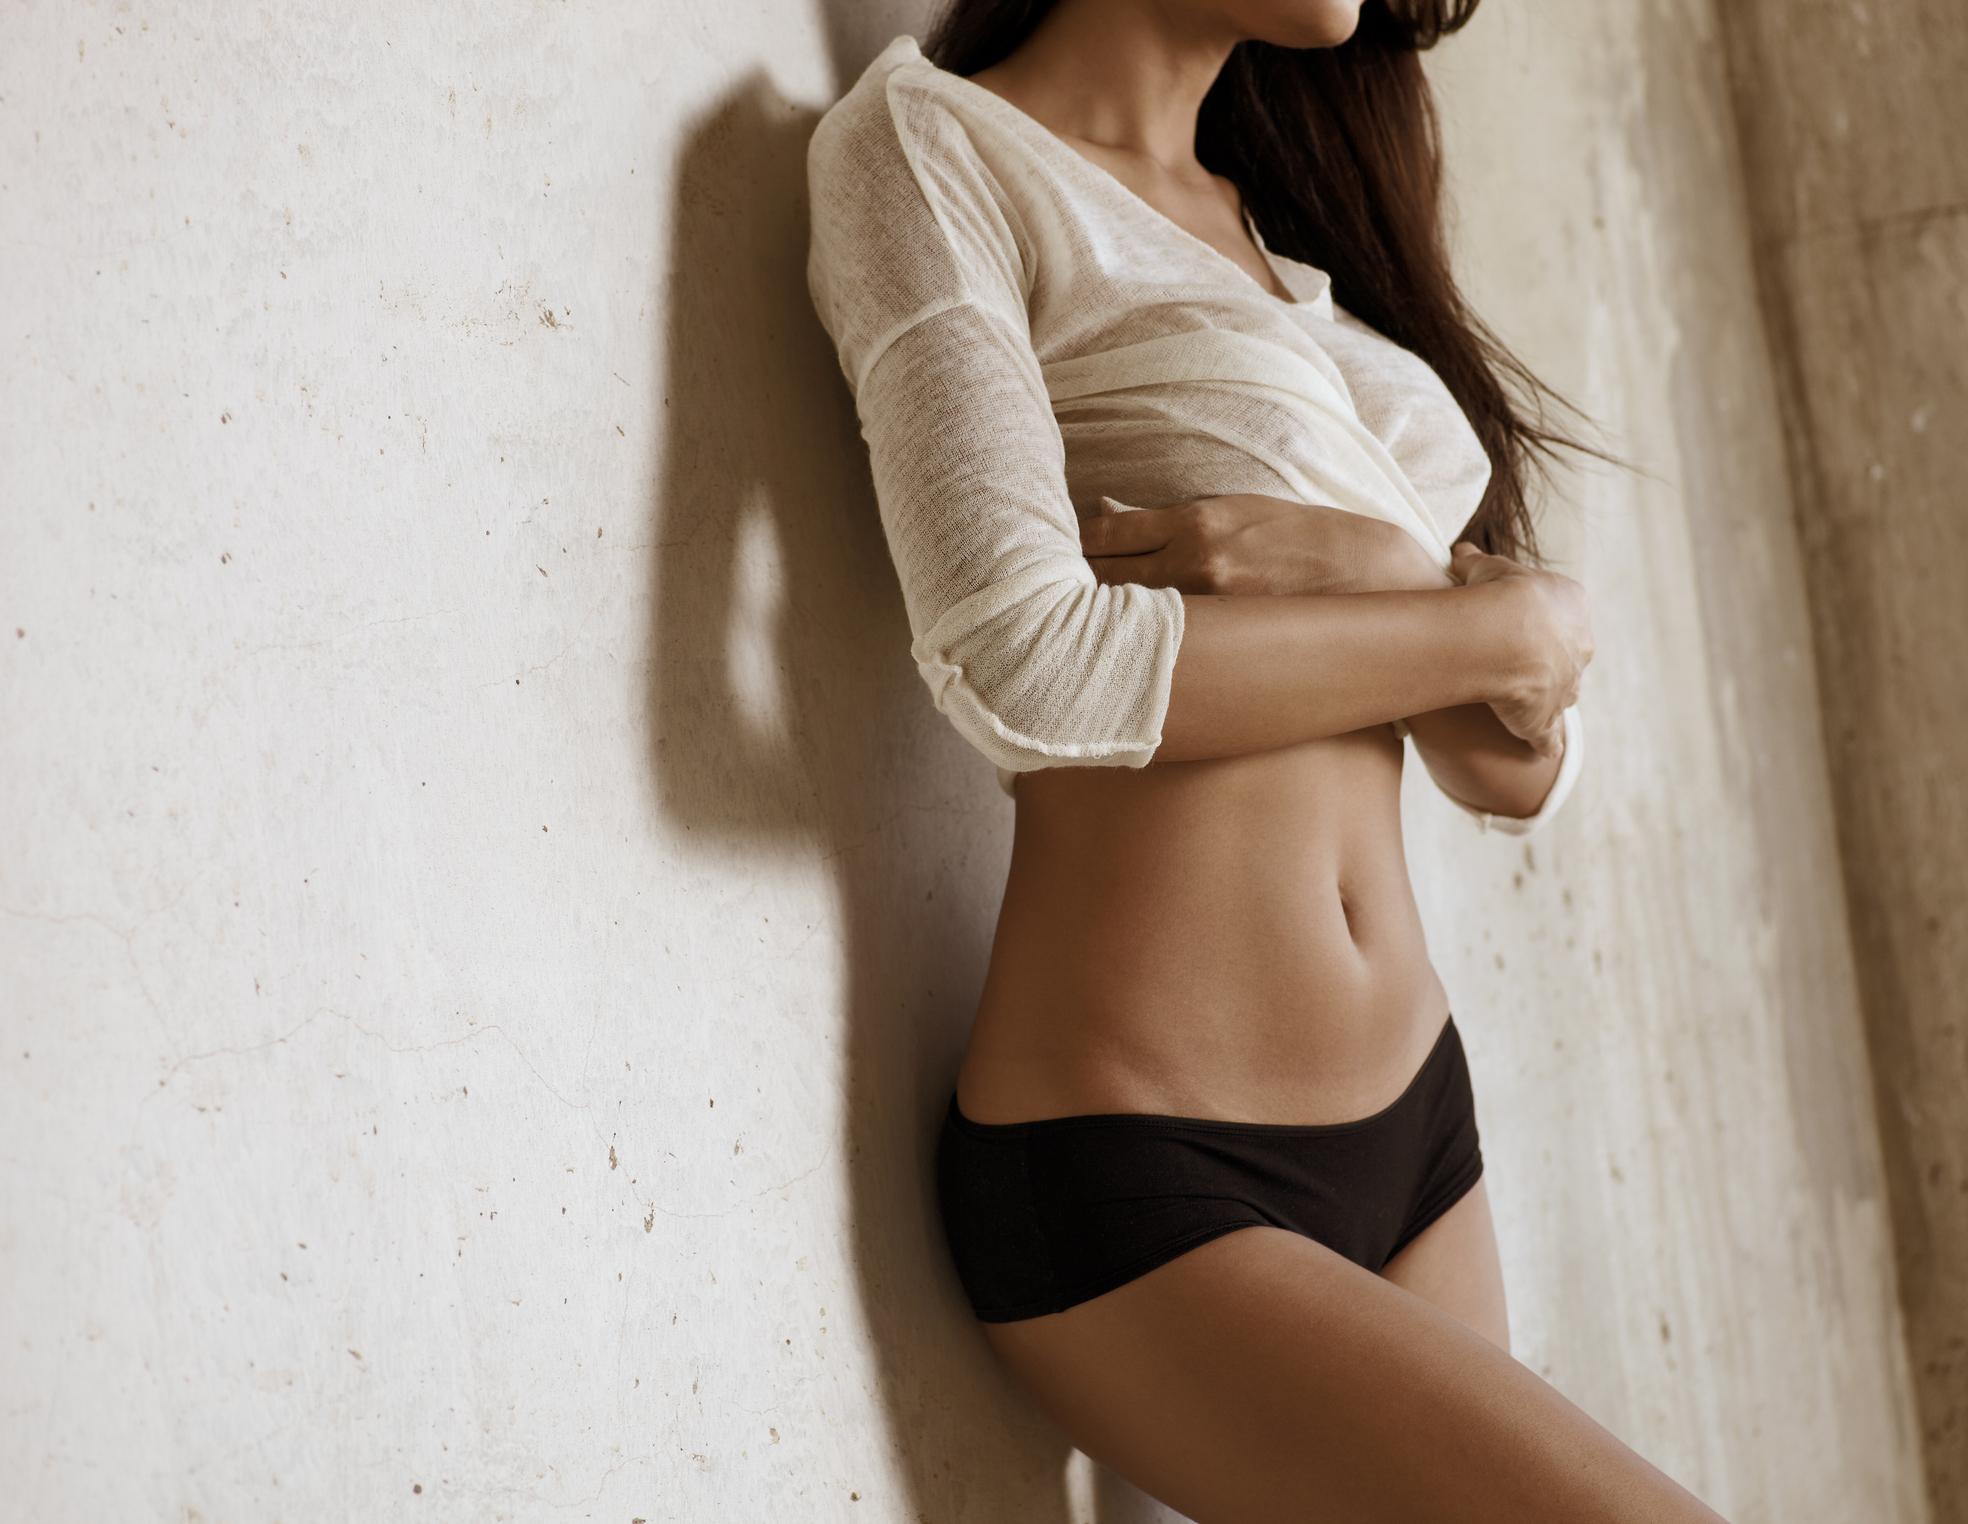 Frau in Unterhose